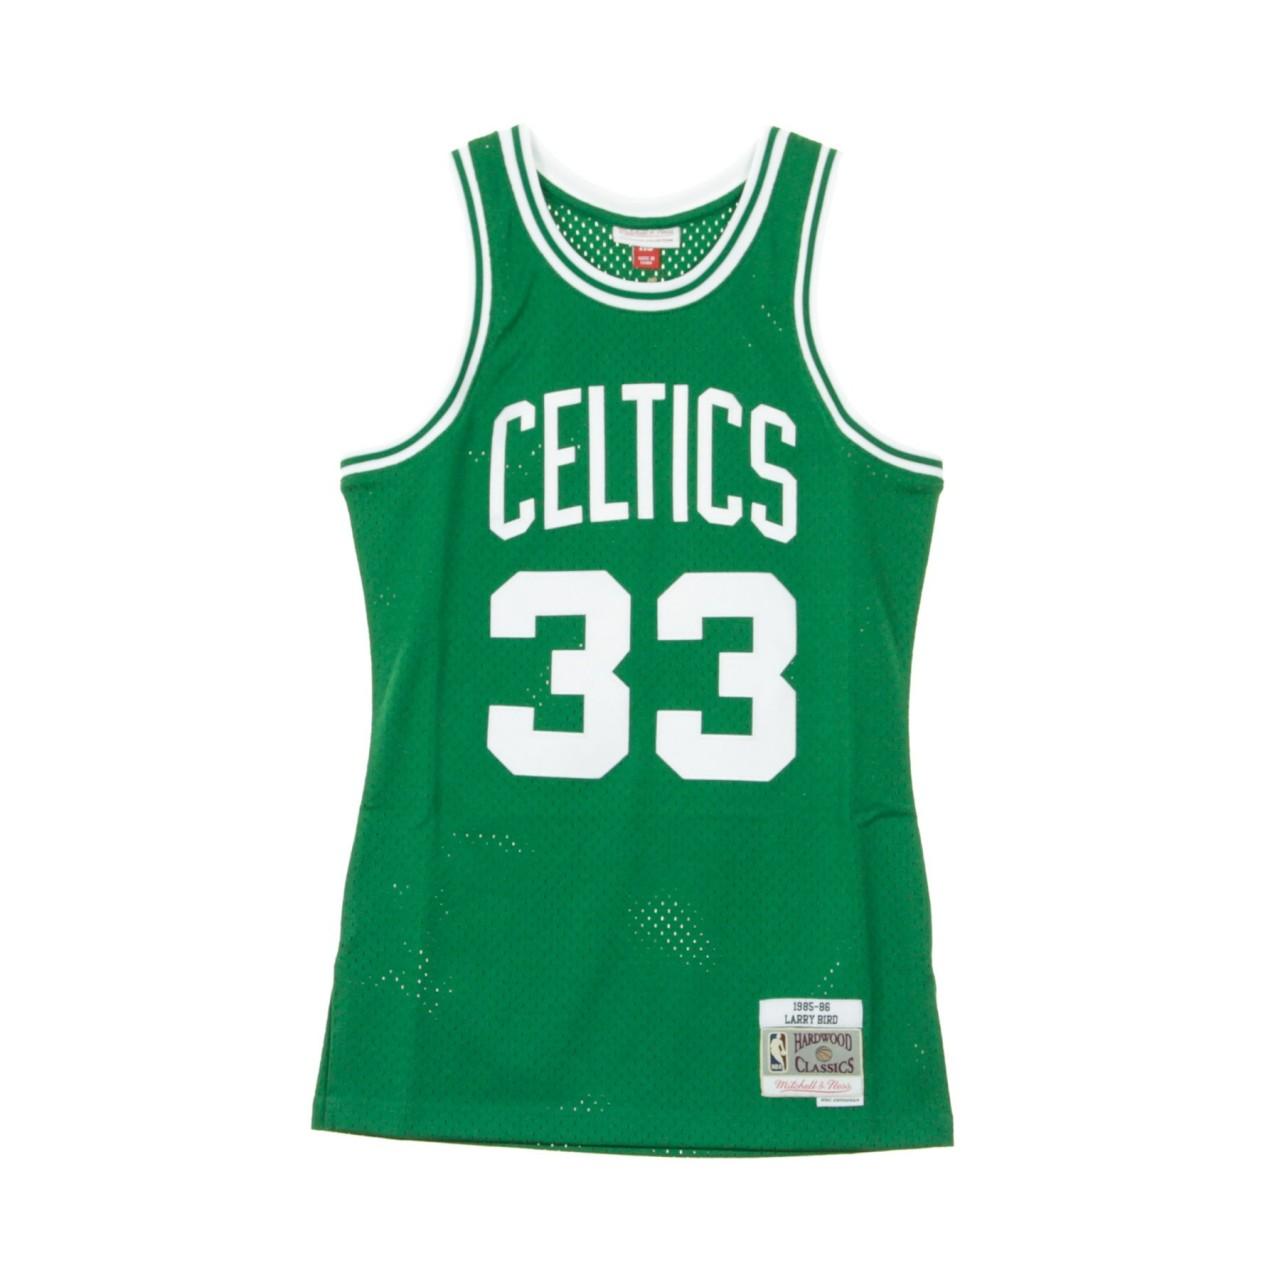 MITCHELL & NESS NBA SWINGMAN JERSEY LARRY BIRD NO.33 1985-86 BOSCEL ROAD MN-NBA-353J-301-FGYLBI-BOSCEL